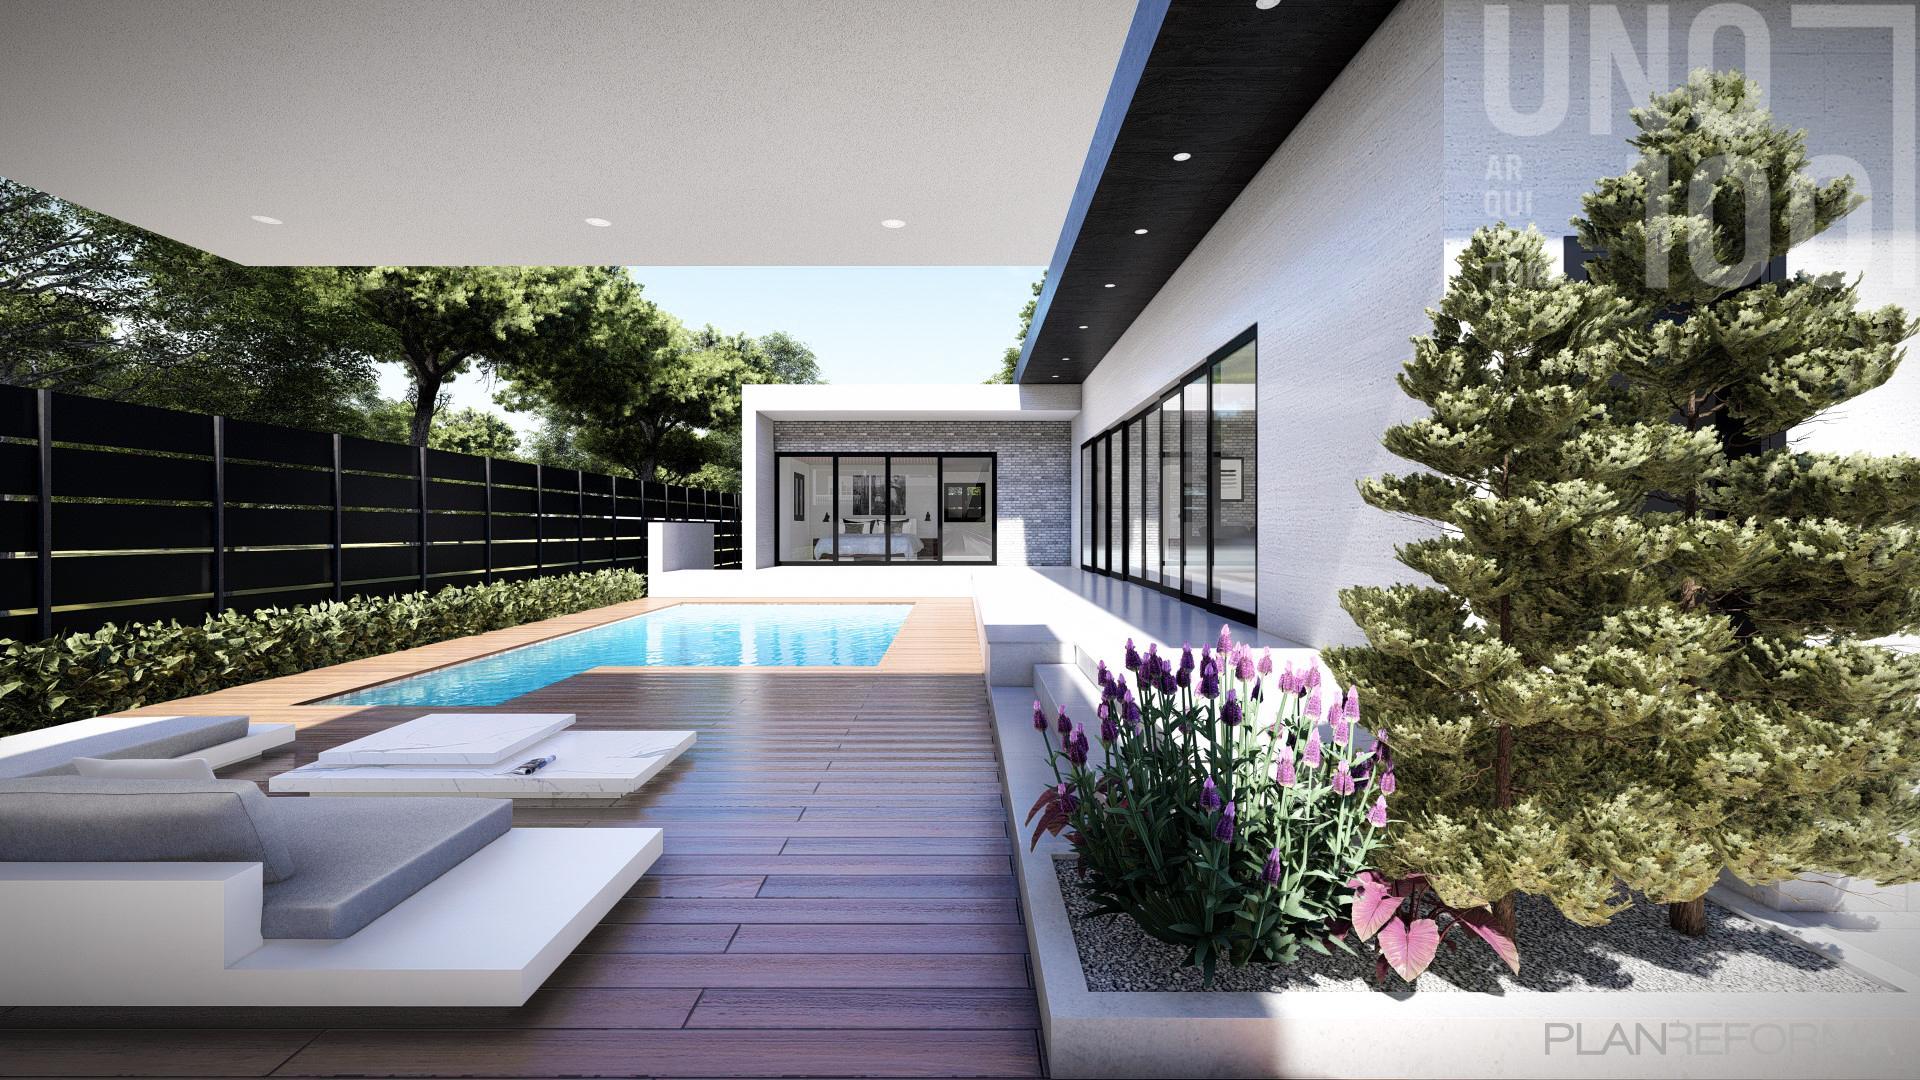 Terraza, Piscina, Exterior Estilo moderno Color verde, marron  diseñado por UNO100 Arquitectura | Arquitecto | Copyright UNO100 Arquitectura